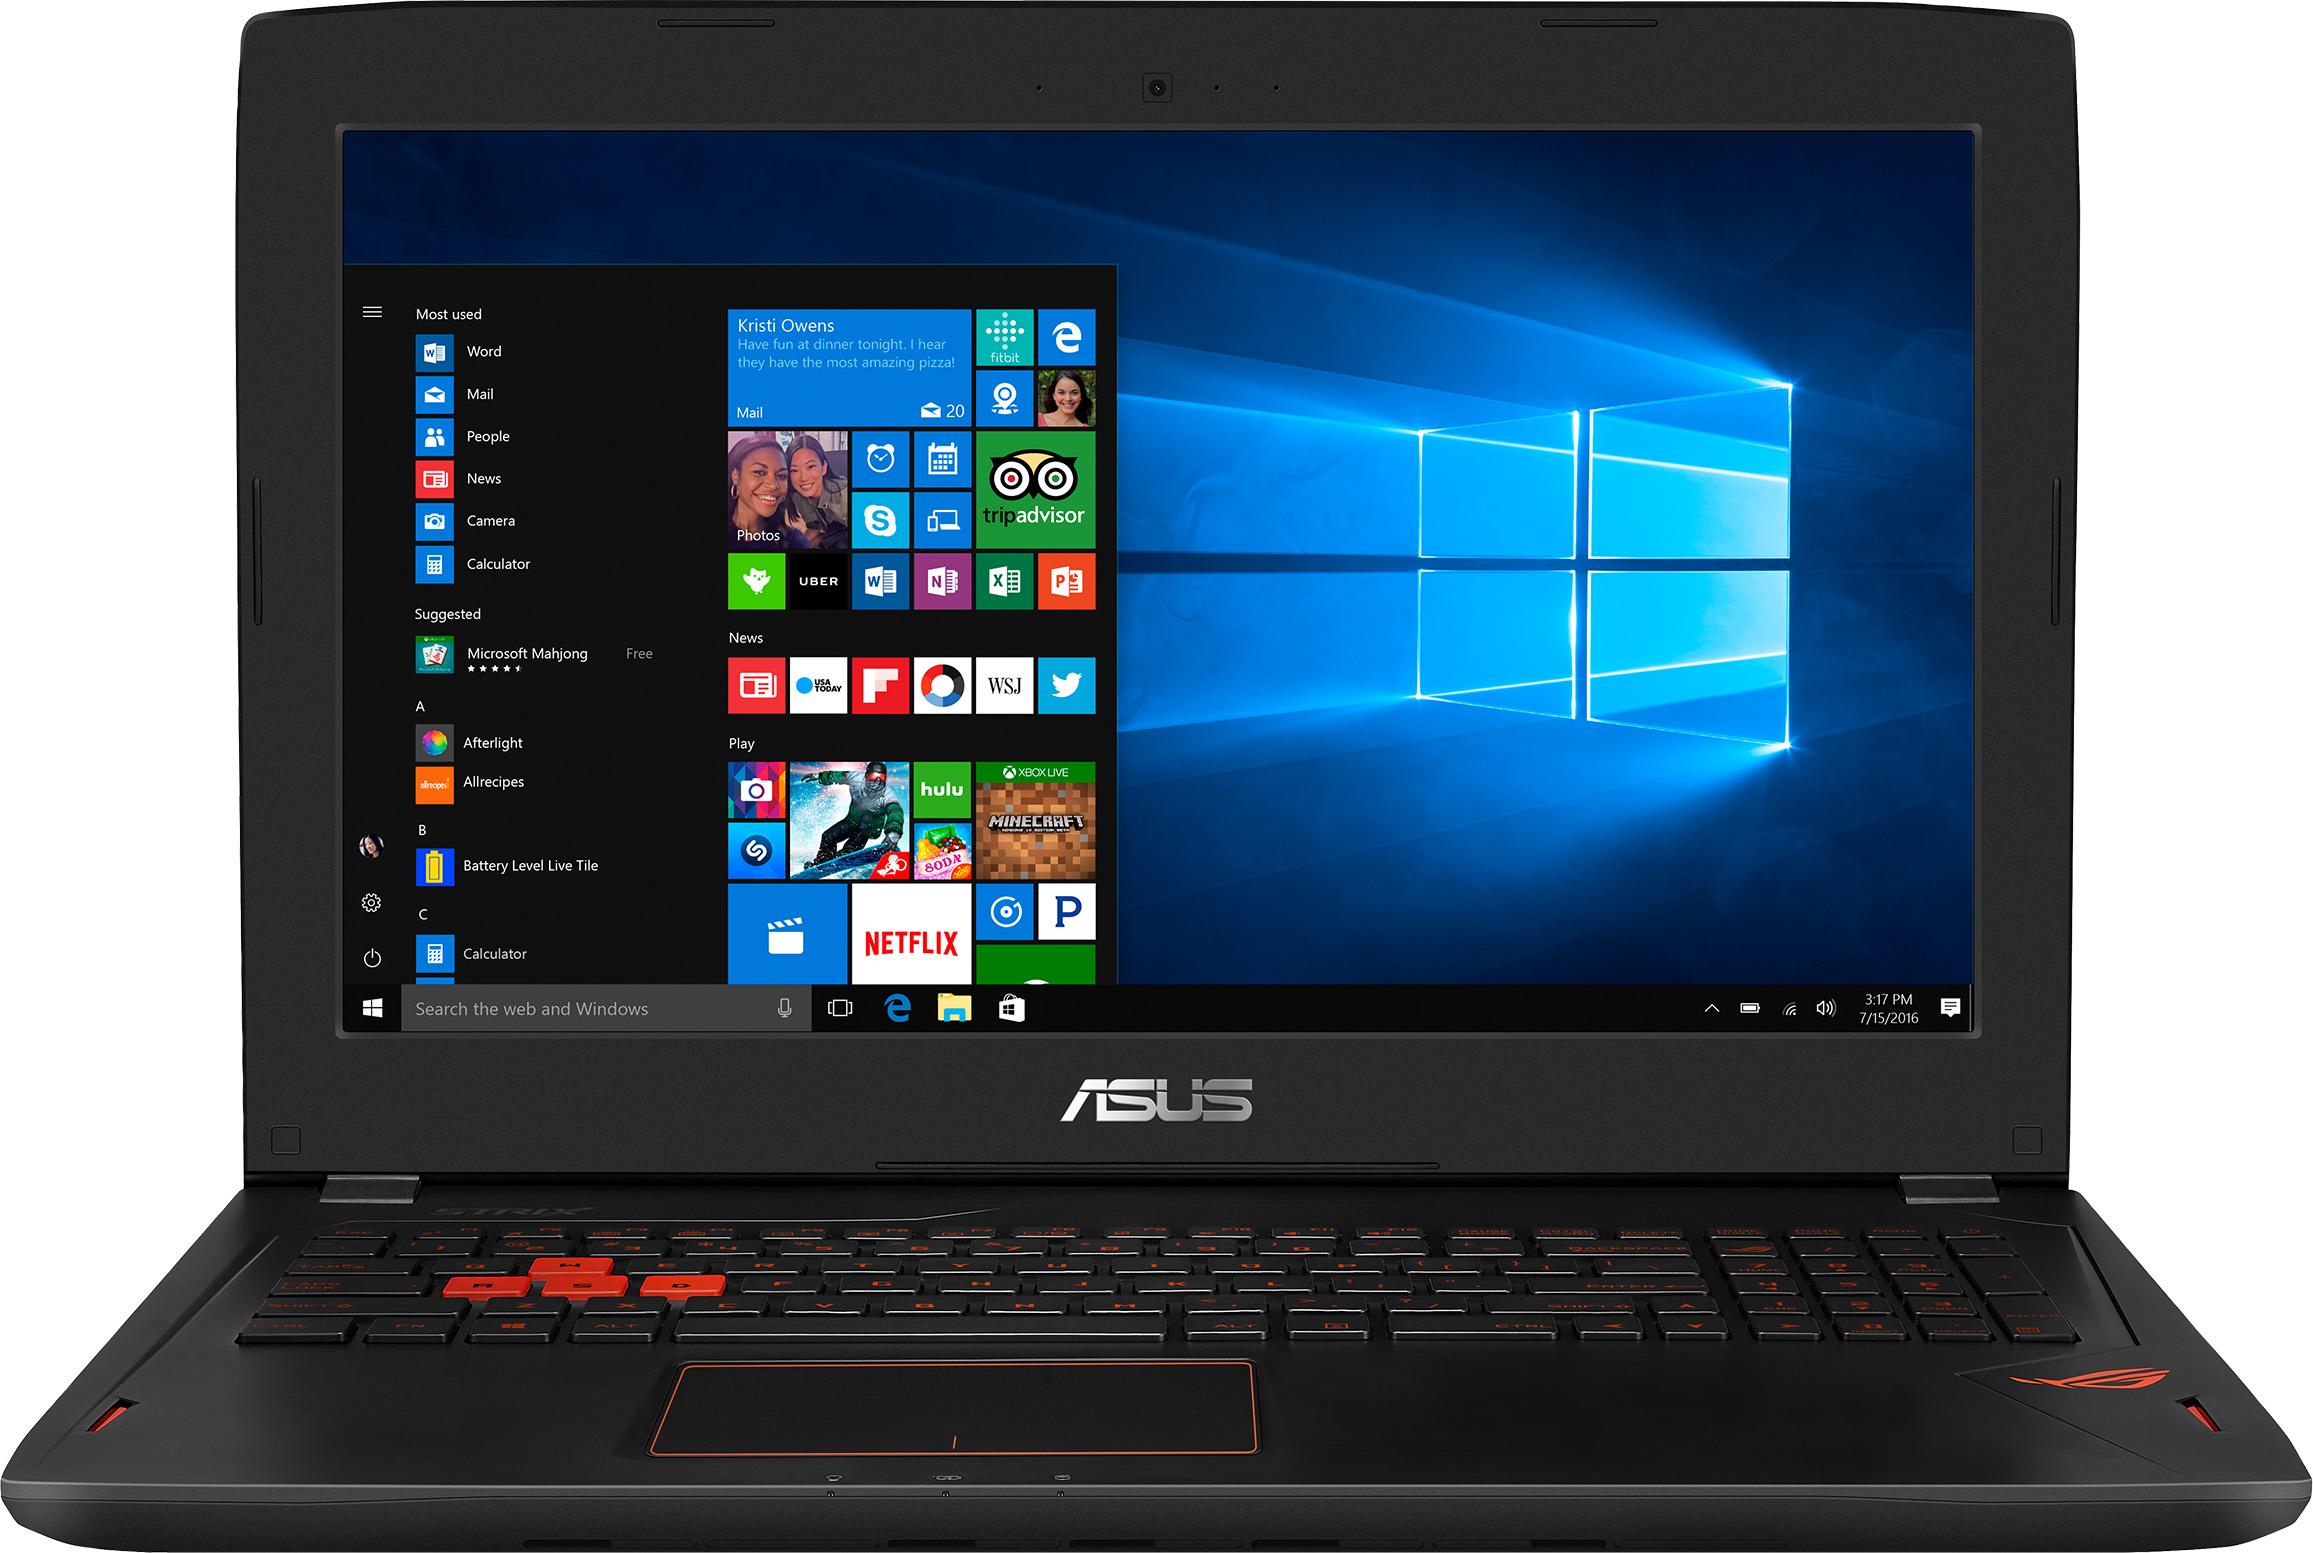 Asus ROG GL502VS-UH71